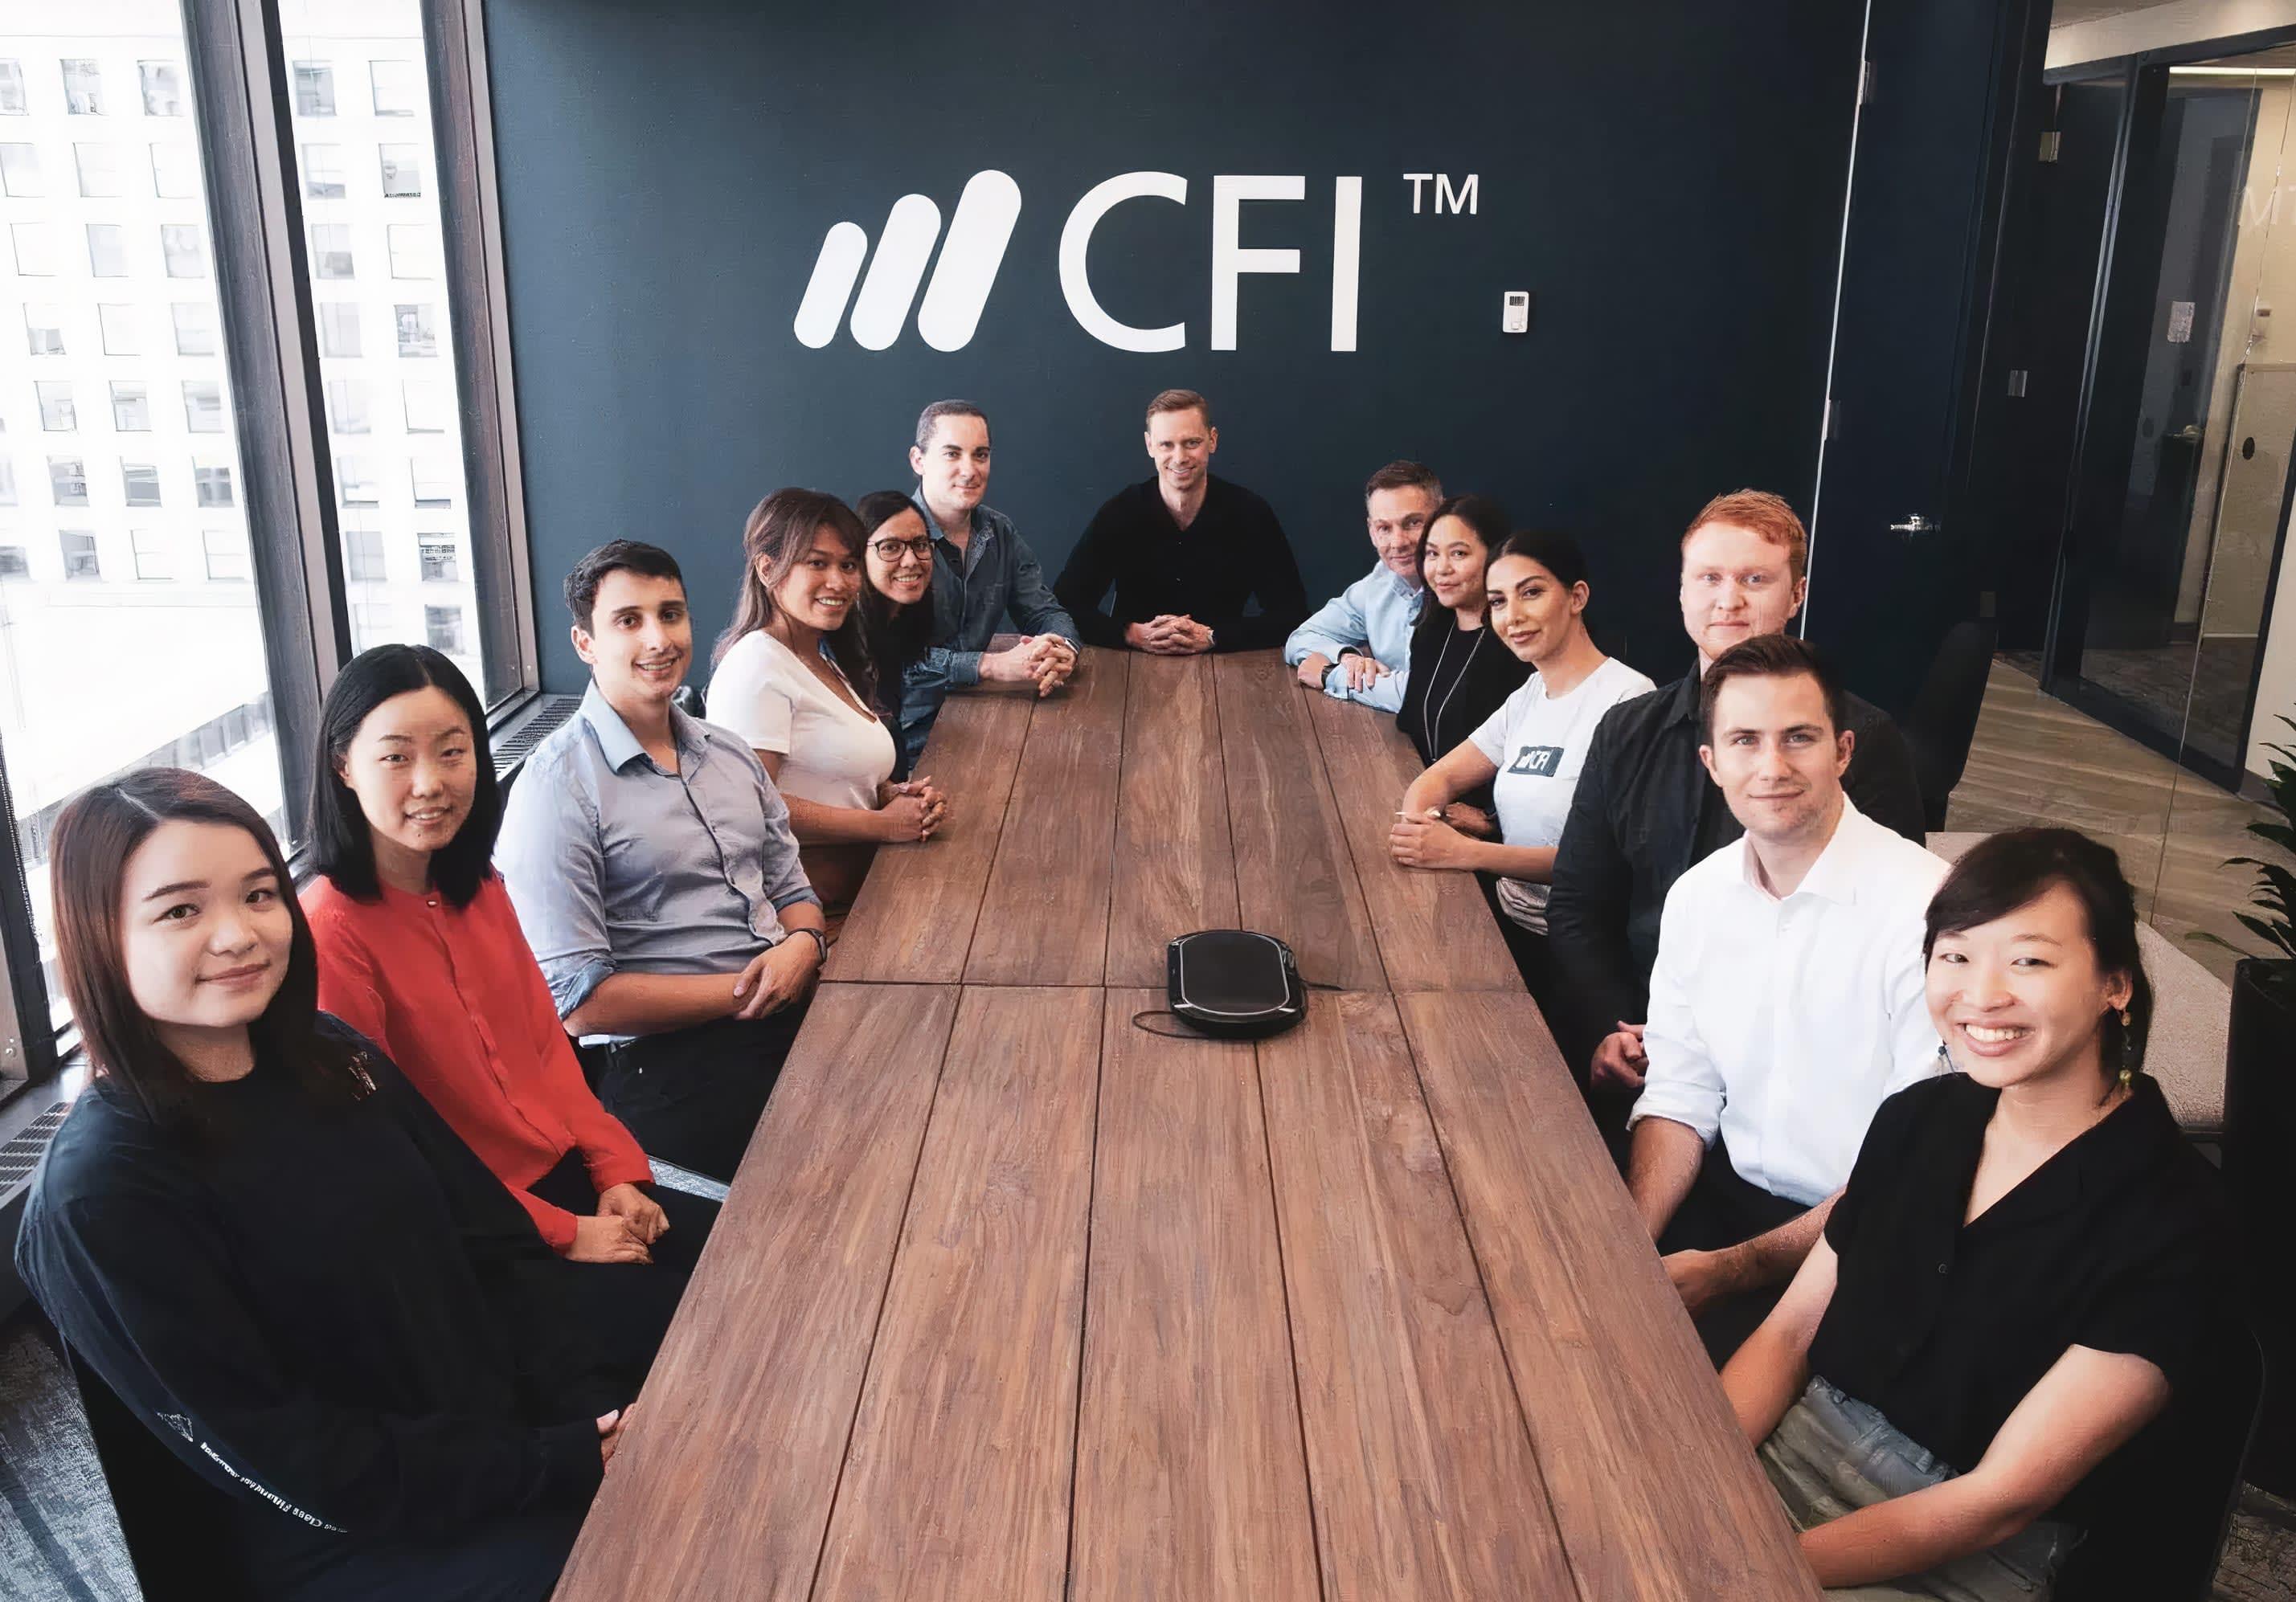 The Corporate Finance Institute (CFI) team in the boardroom